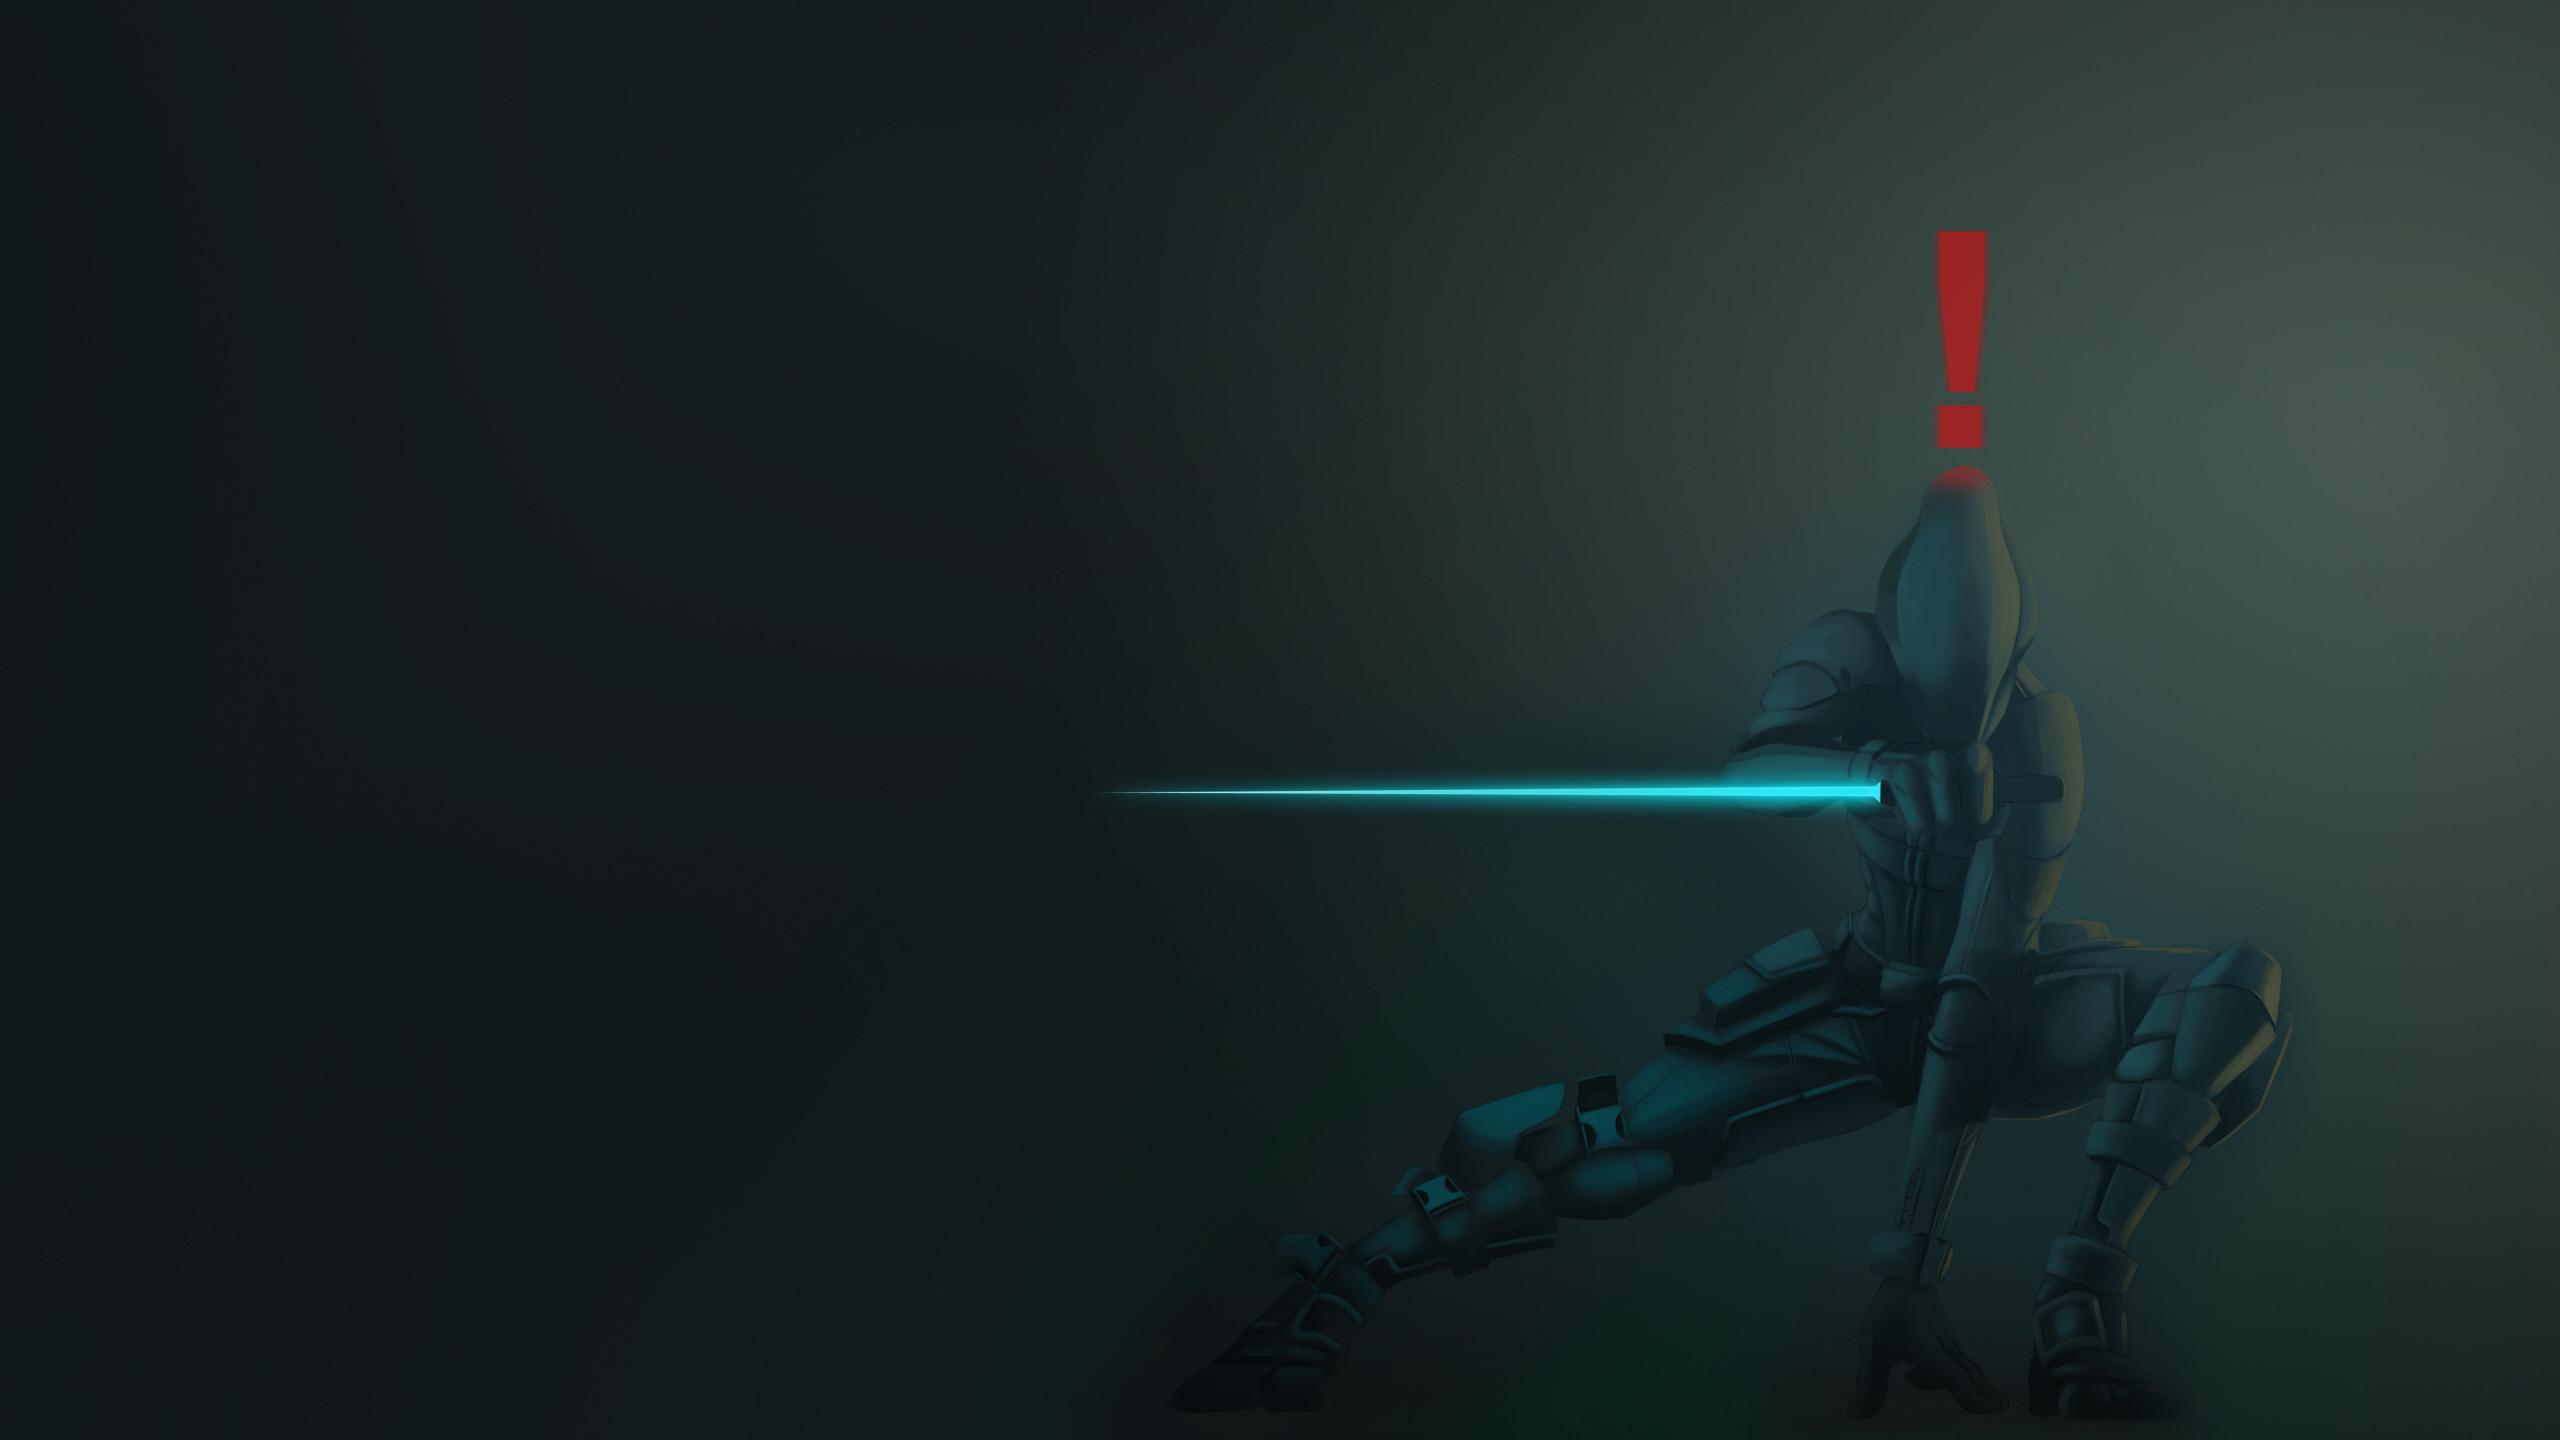 … Borderlands 2 – Zer0 (Metal Gear Solid HUD) by Faziri